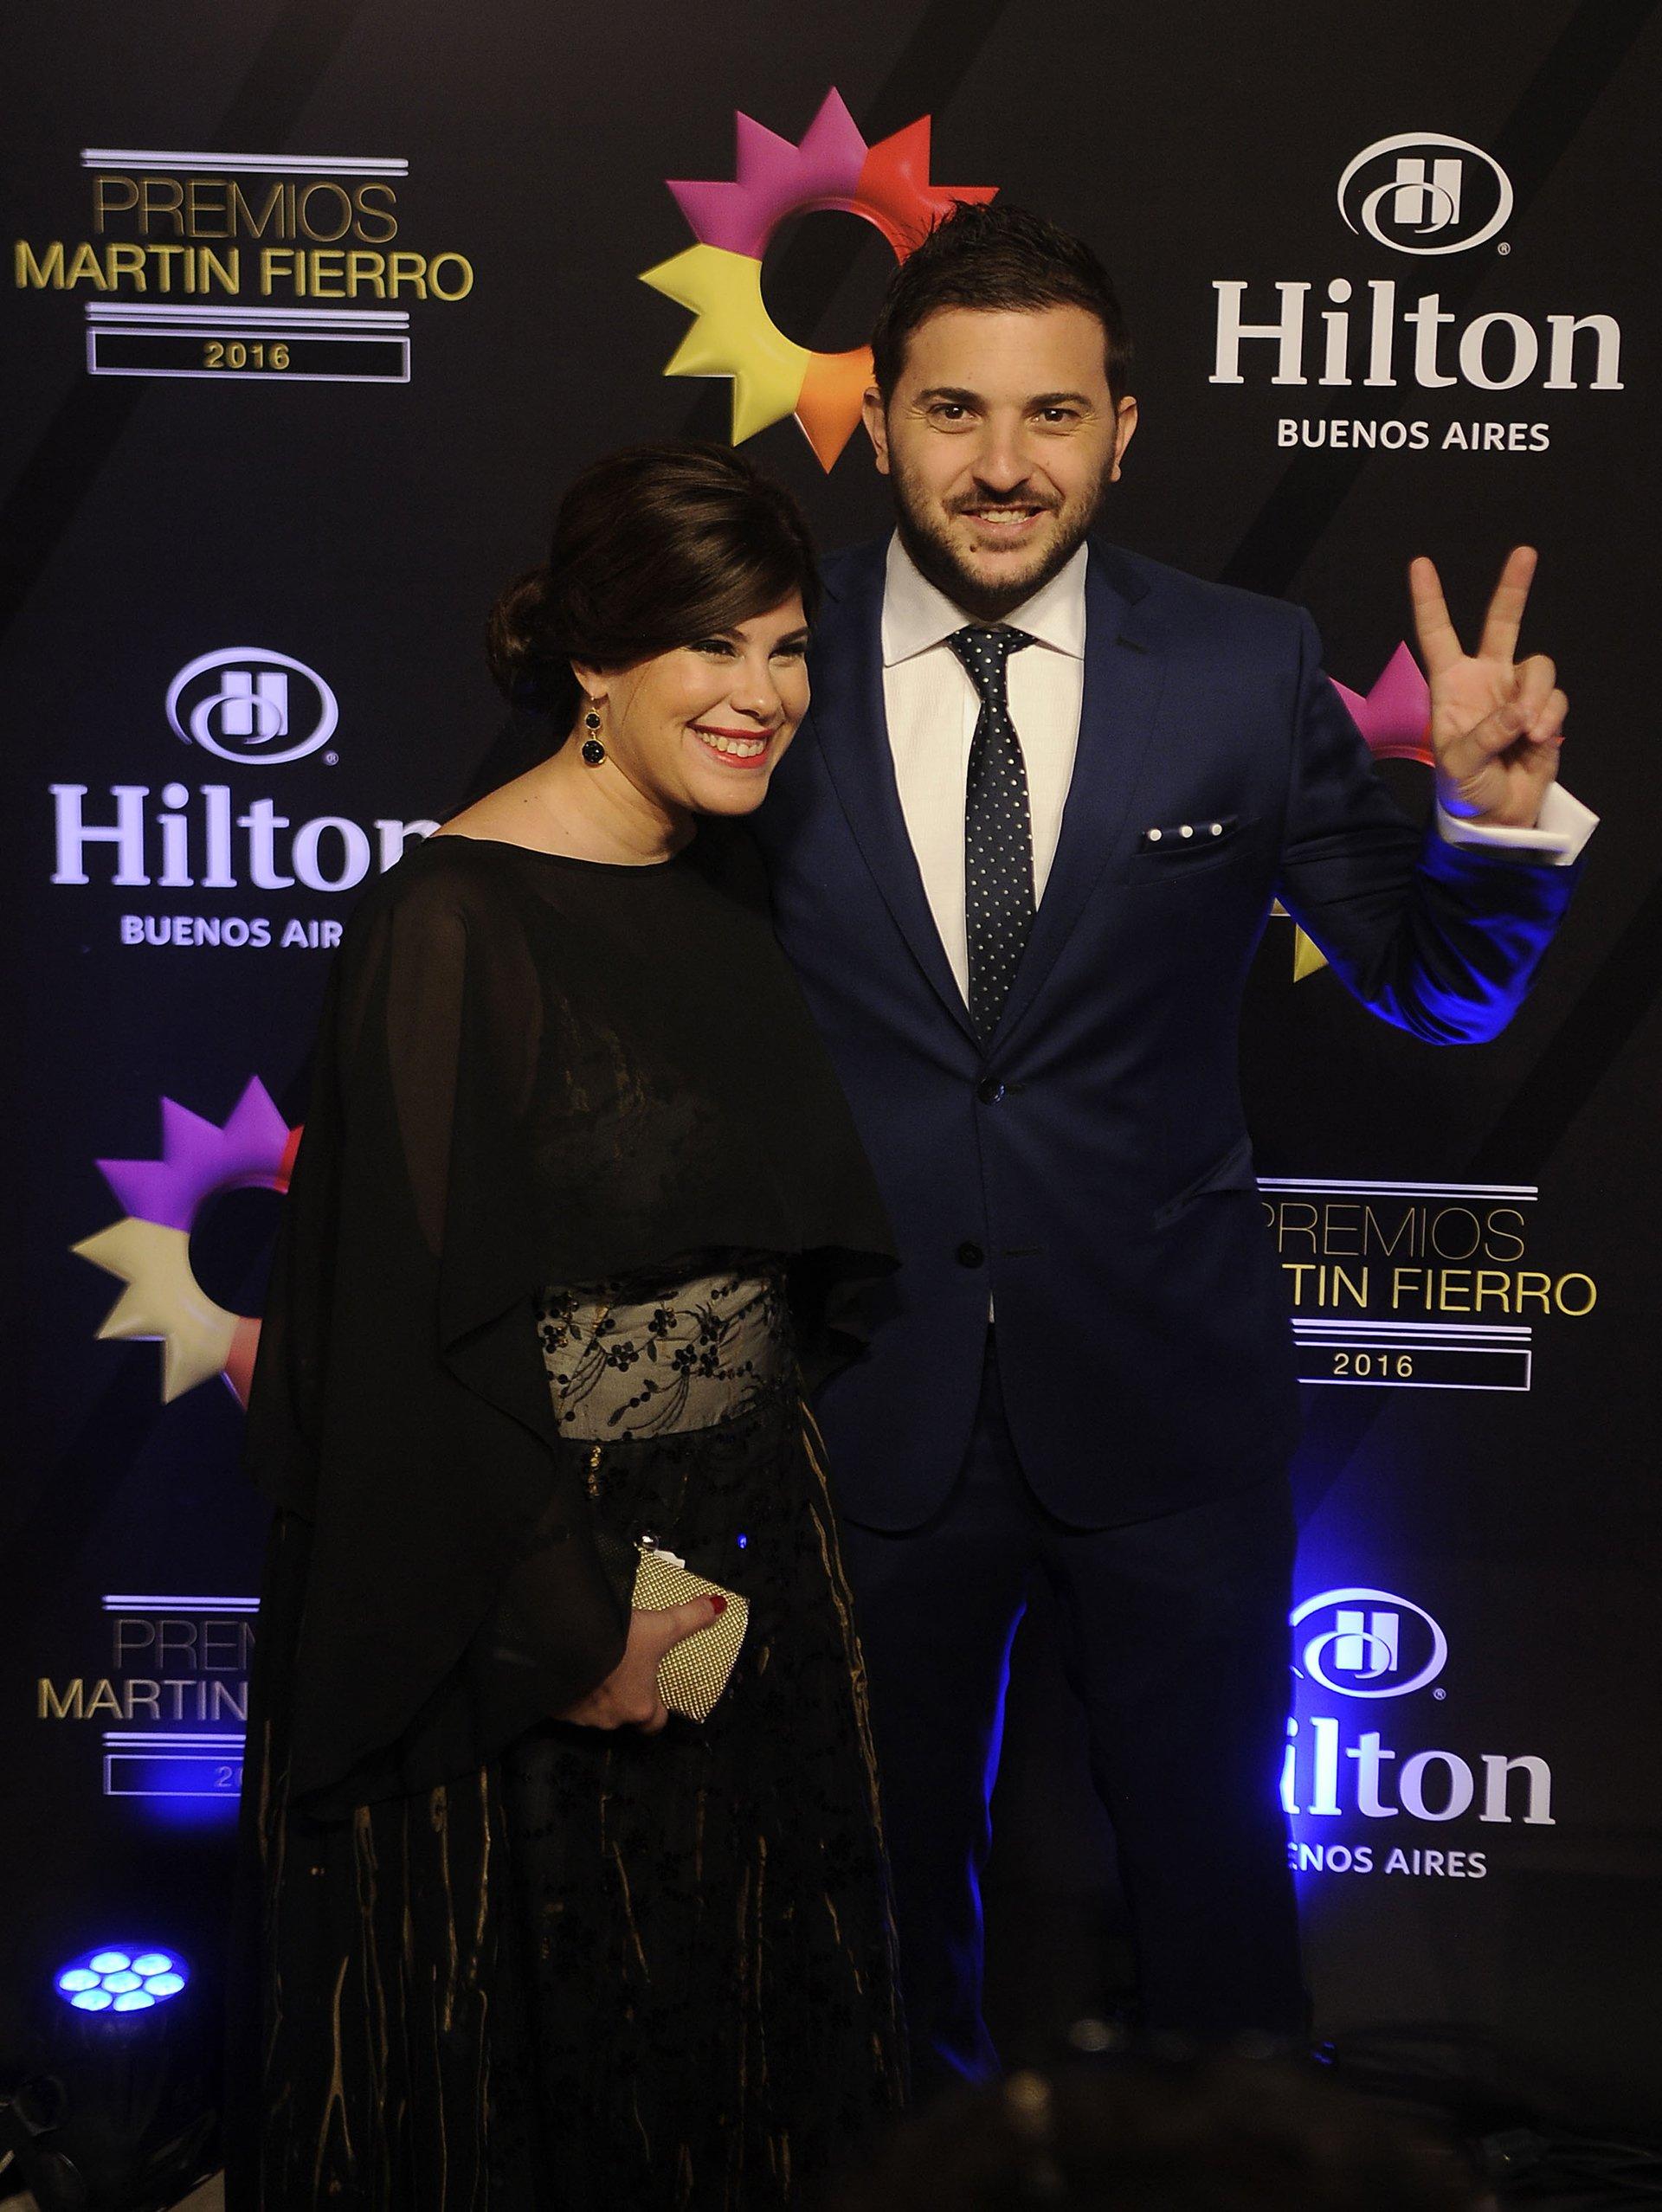 El periodista Diego Brancatelli junto a su esposa, también periodista Cecilia Insinga.